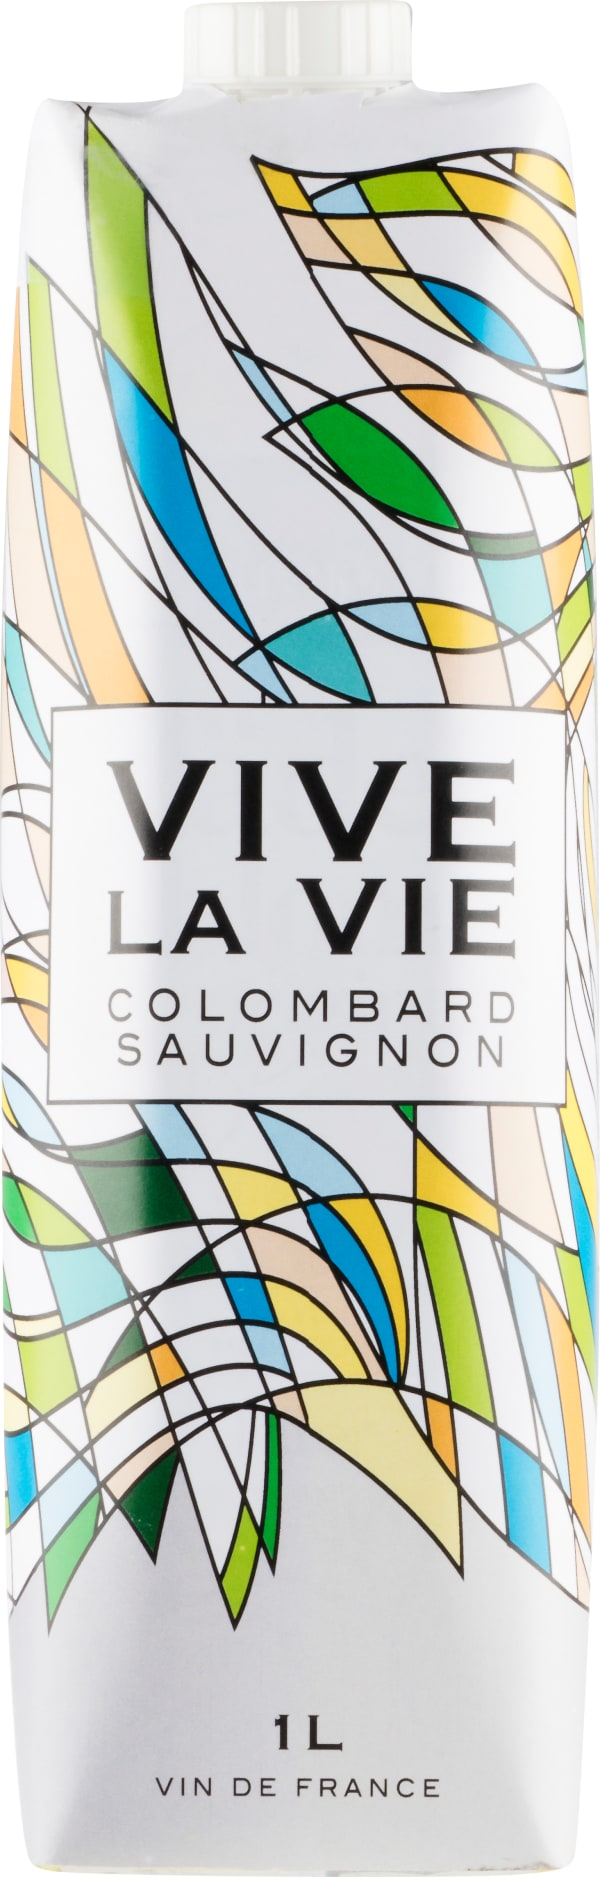 Vive la Vie Colombard Sauvignon 2020 kartongförpackning